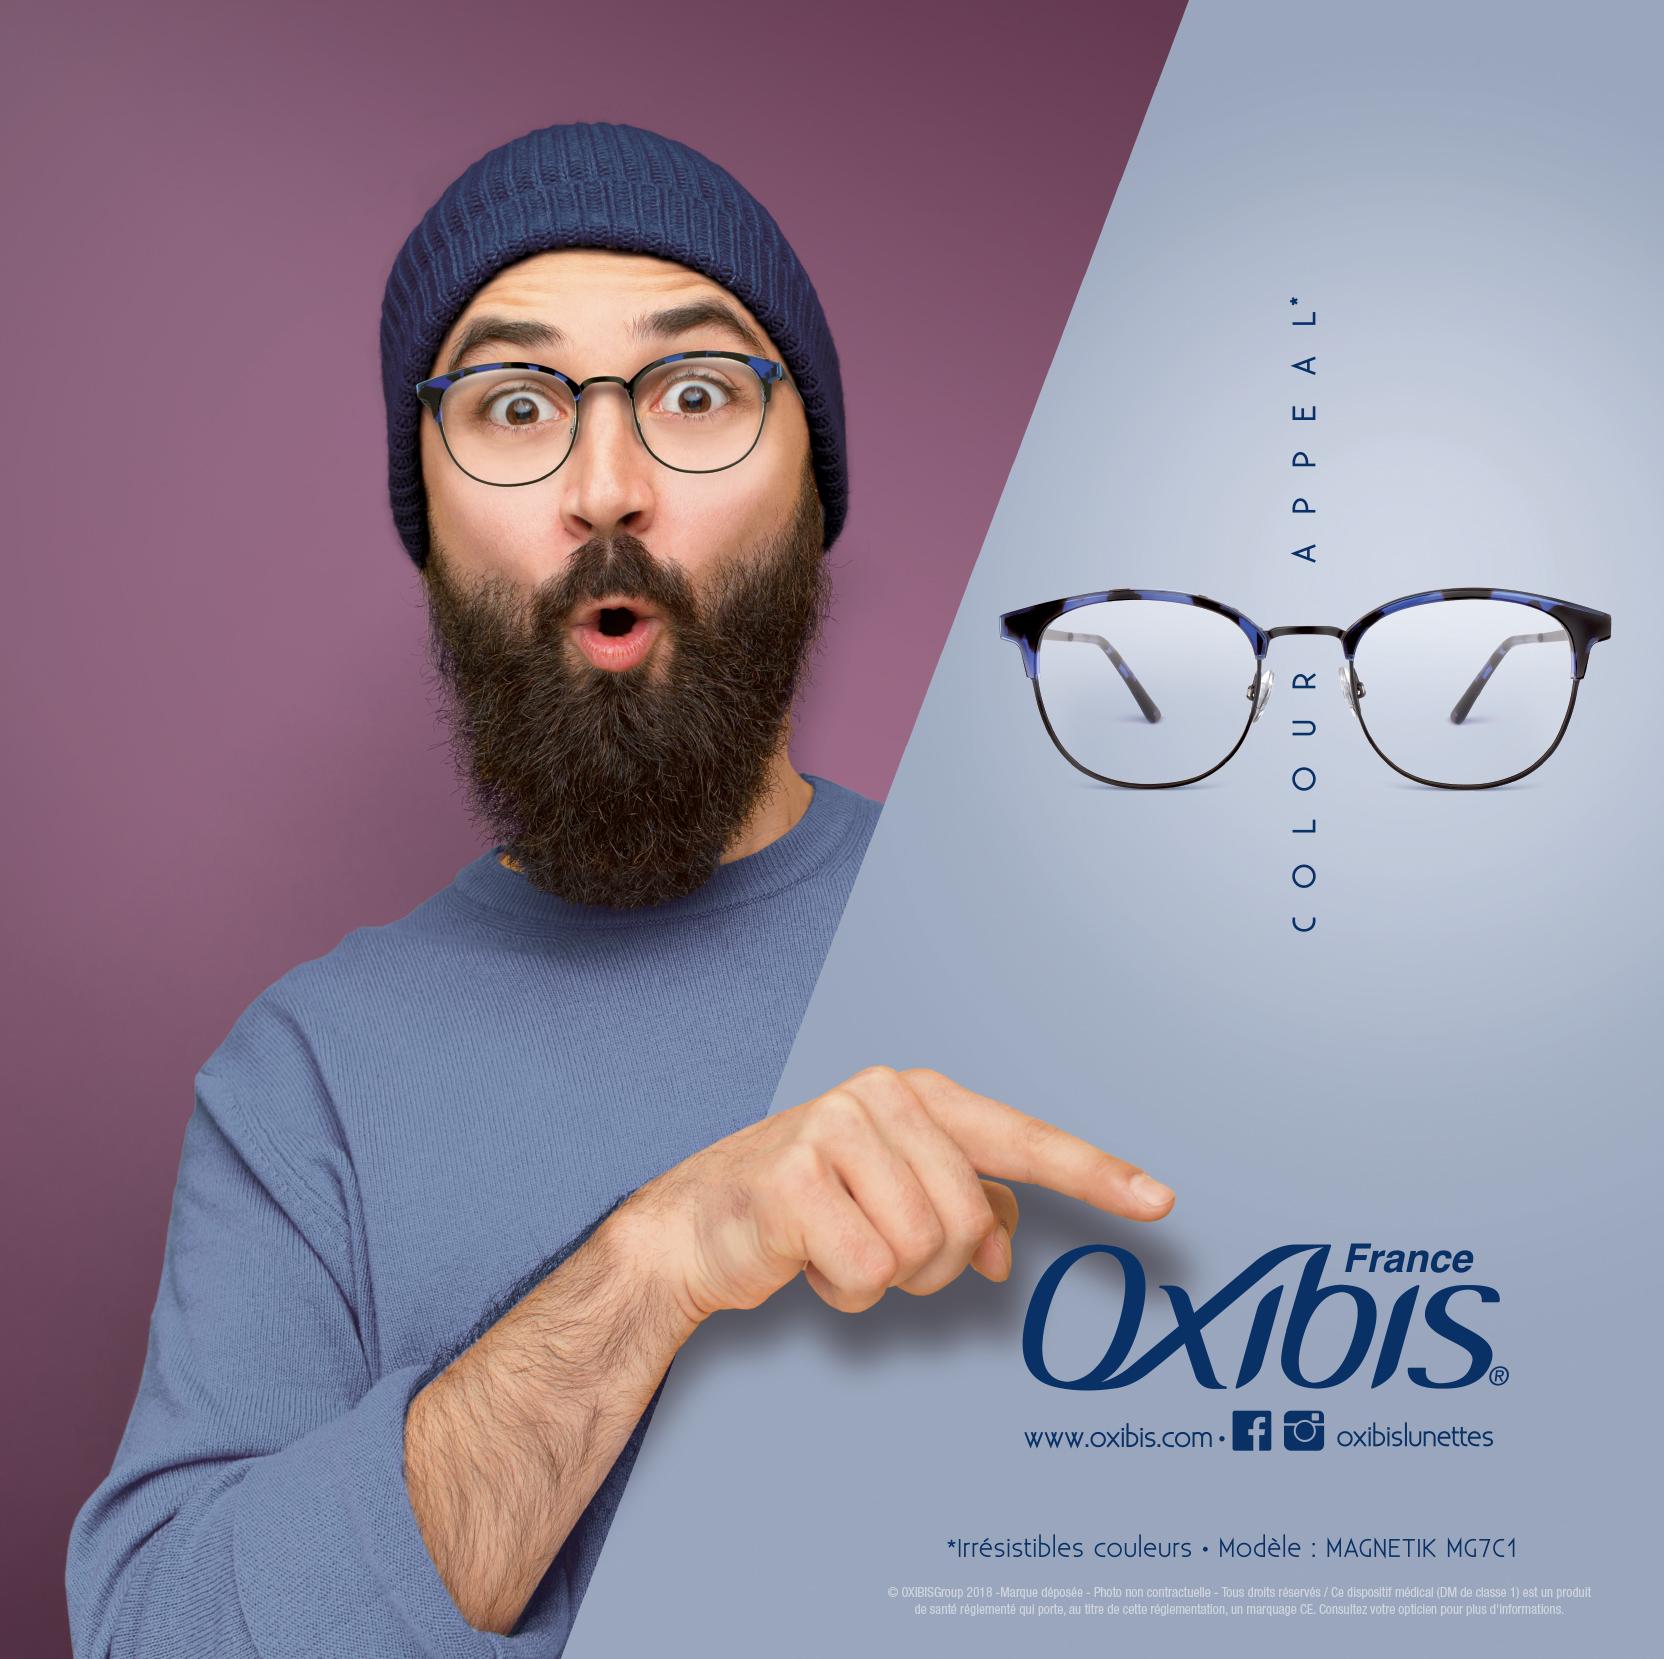 oxibis HOMME 15x15.jpg